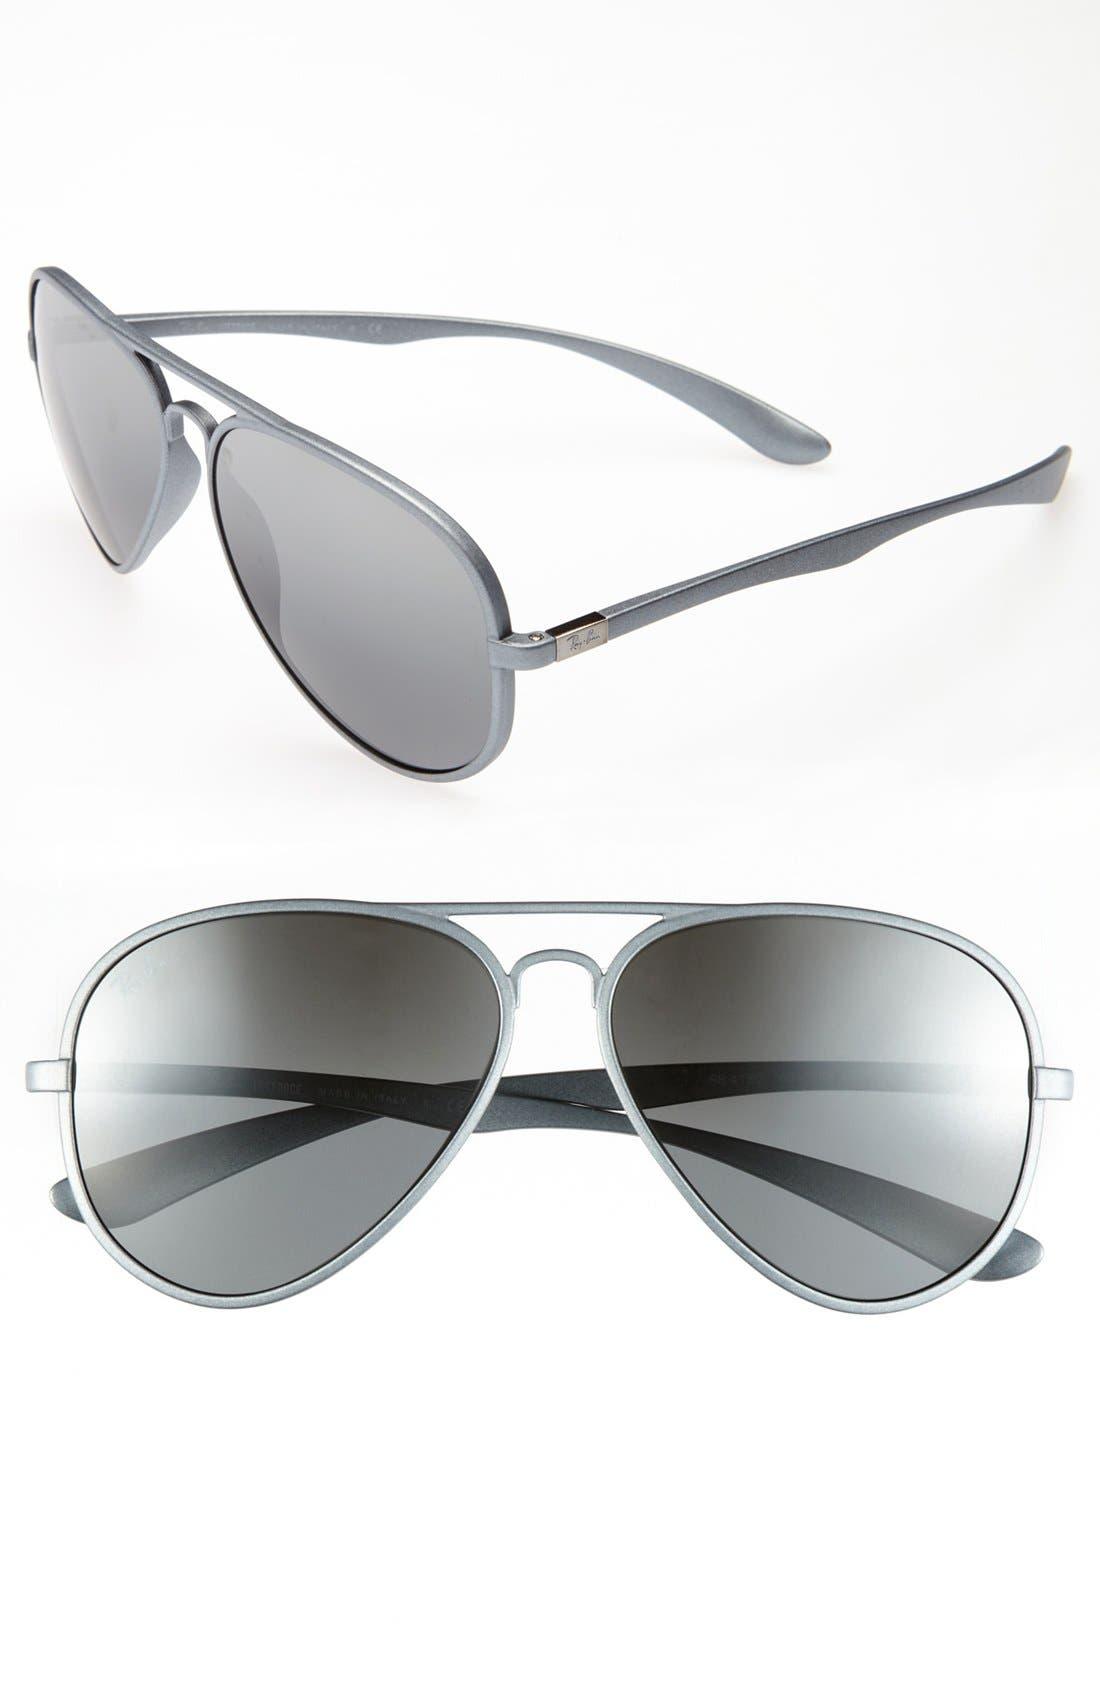 58mm Aviator Sunglasses,                         Main,                         color, Metallic Silver